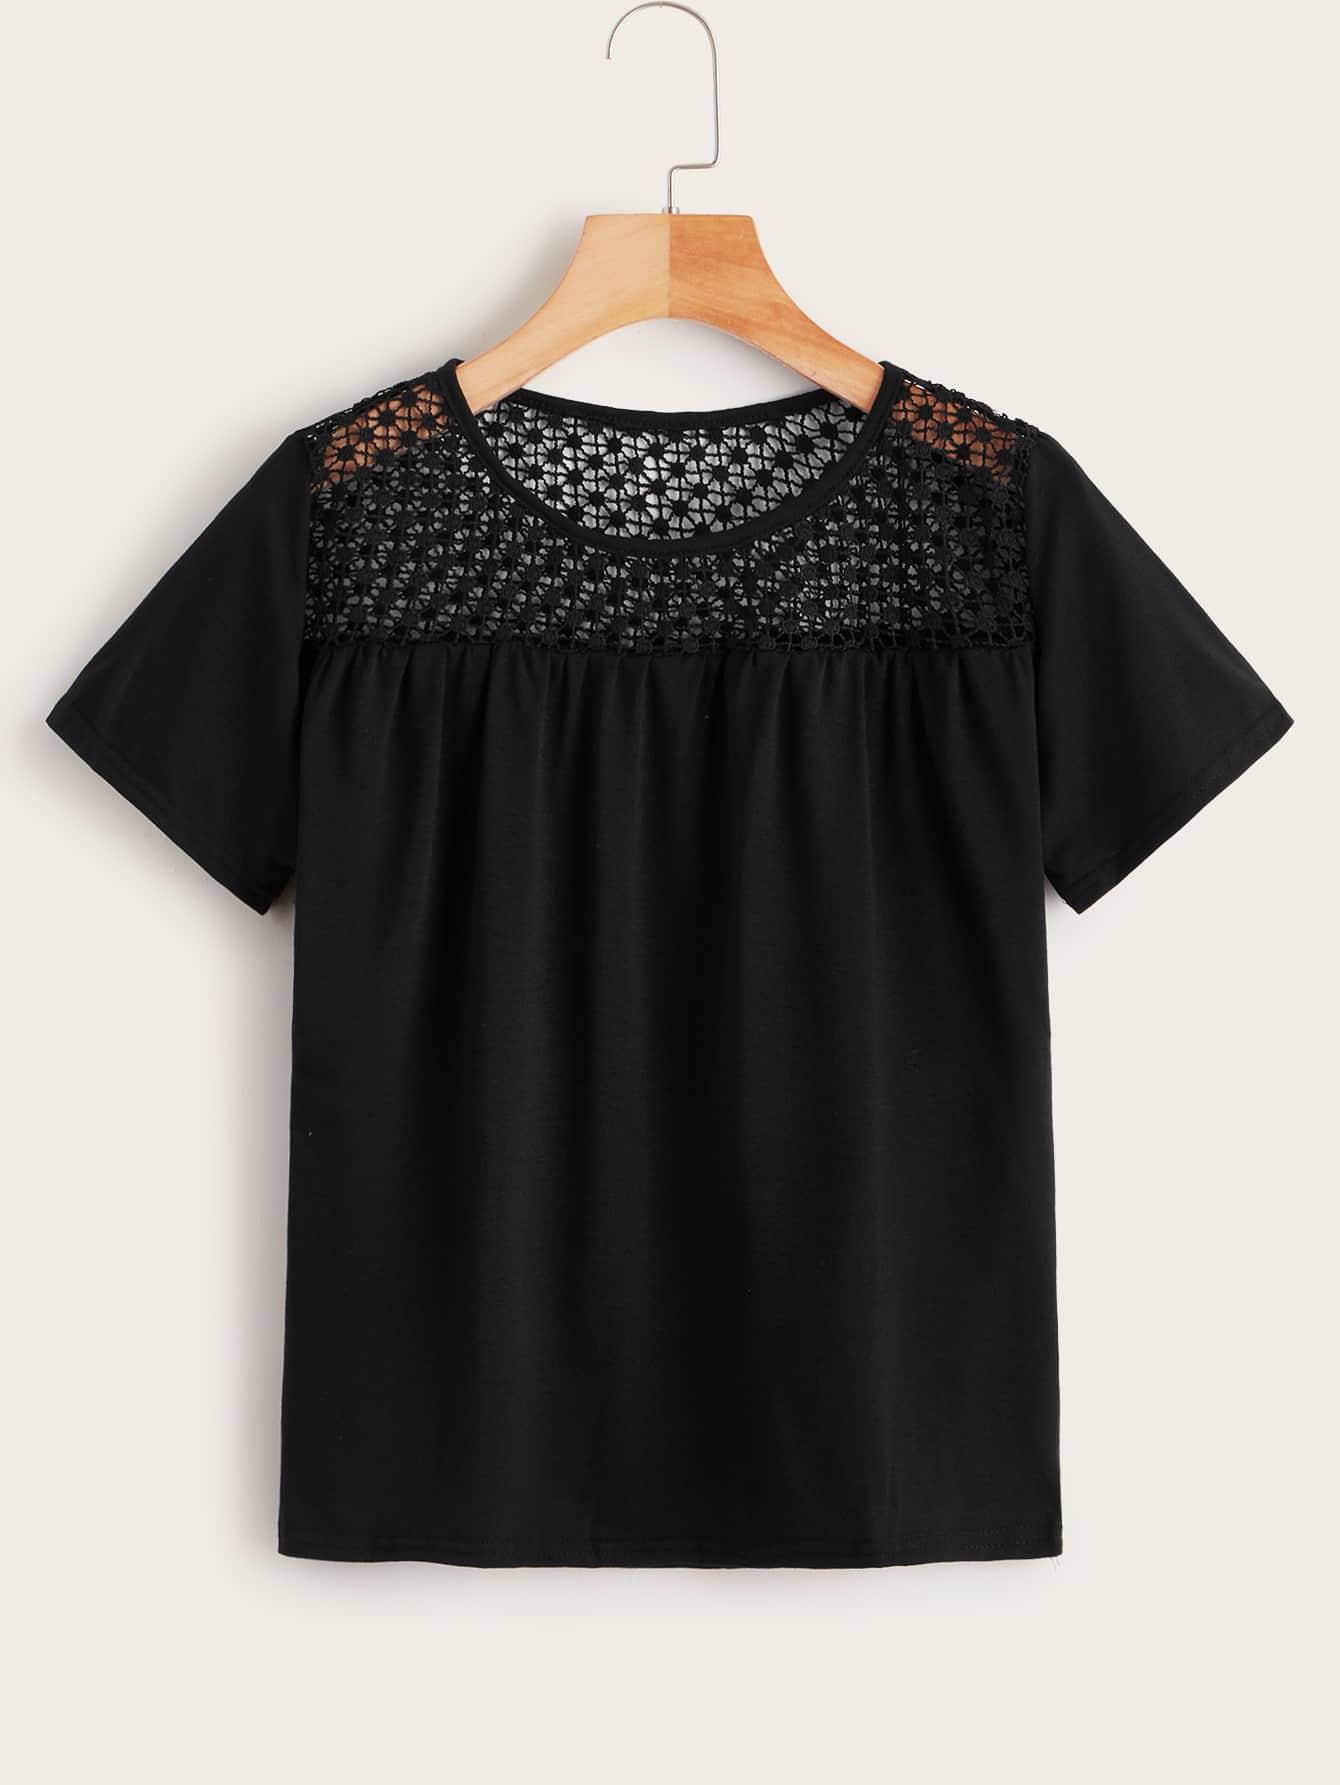 Фото - Однотонная футболка с разрезом от SheIn черного цвета